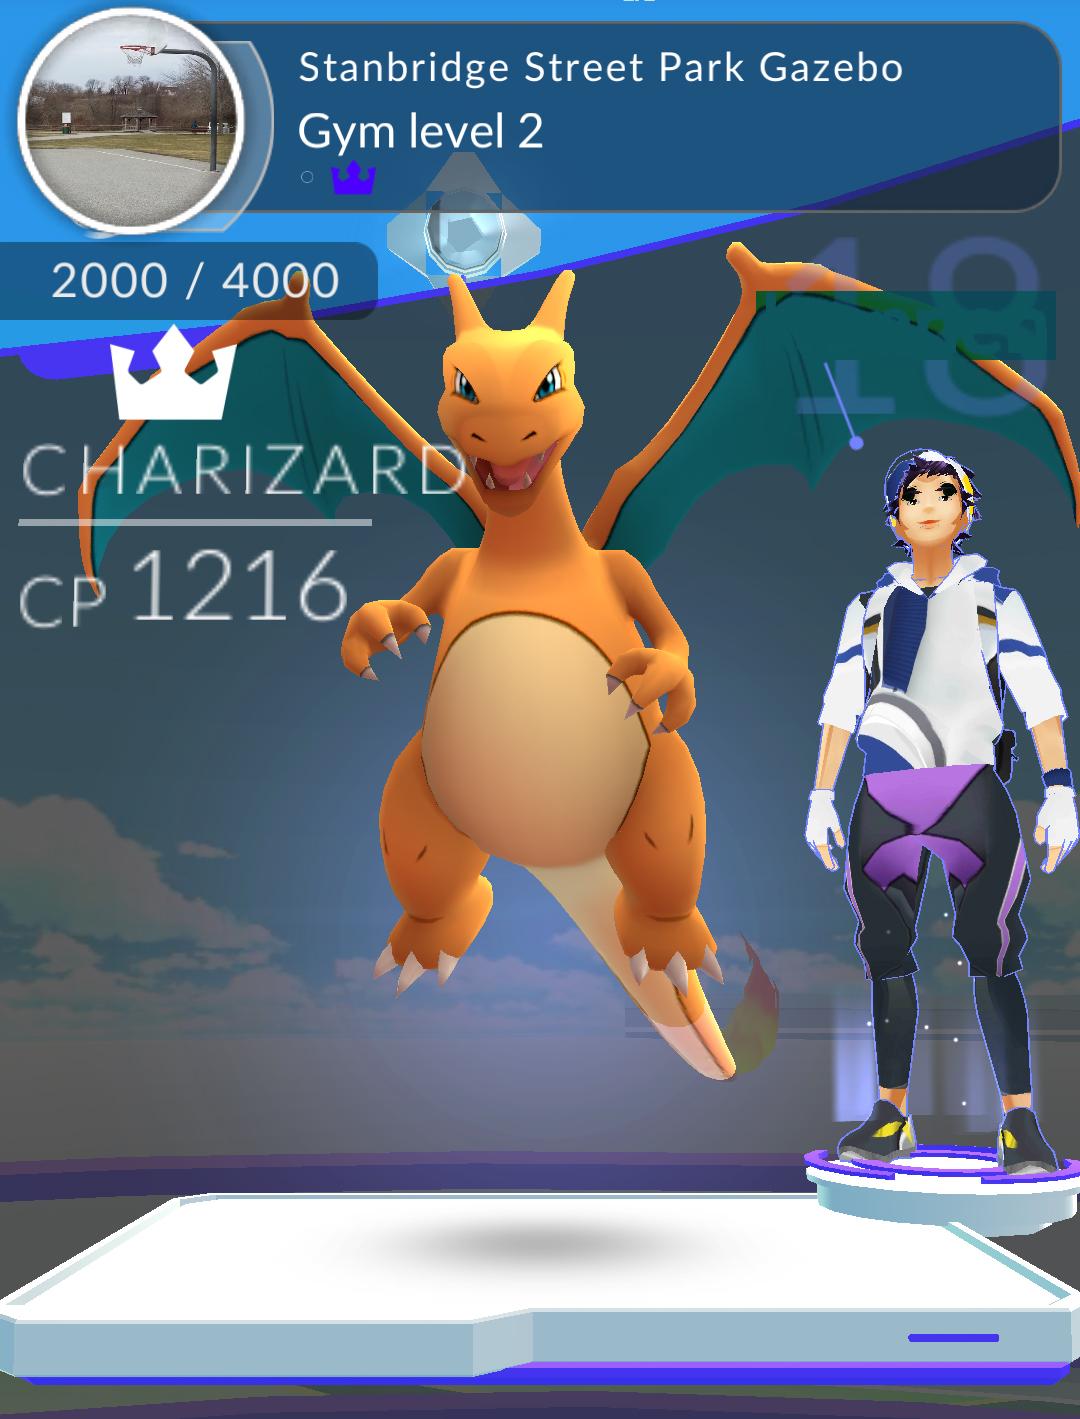 A Fitting Pokémon for the Nearest Gym